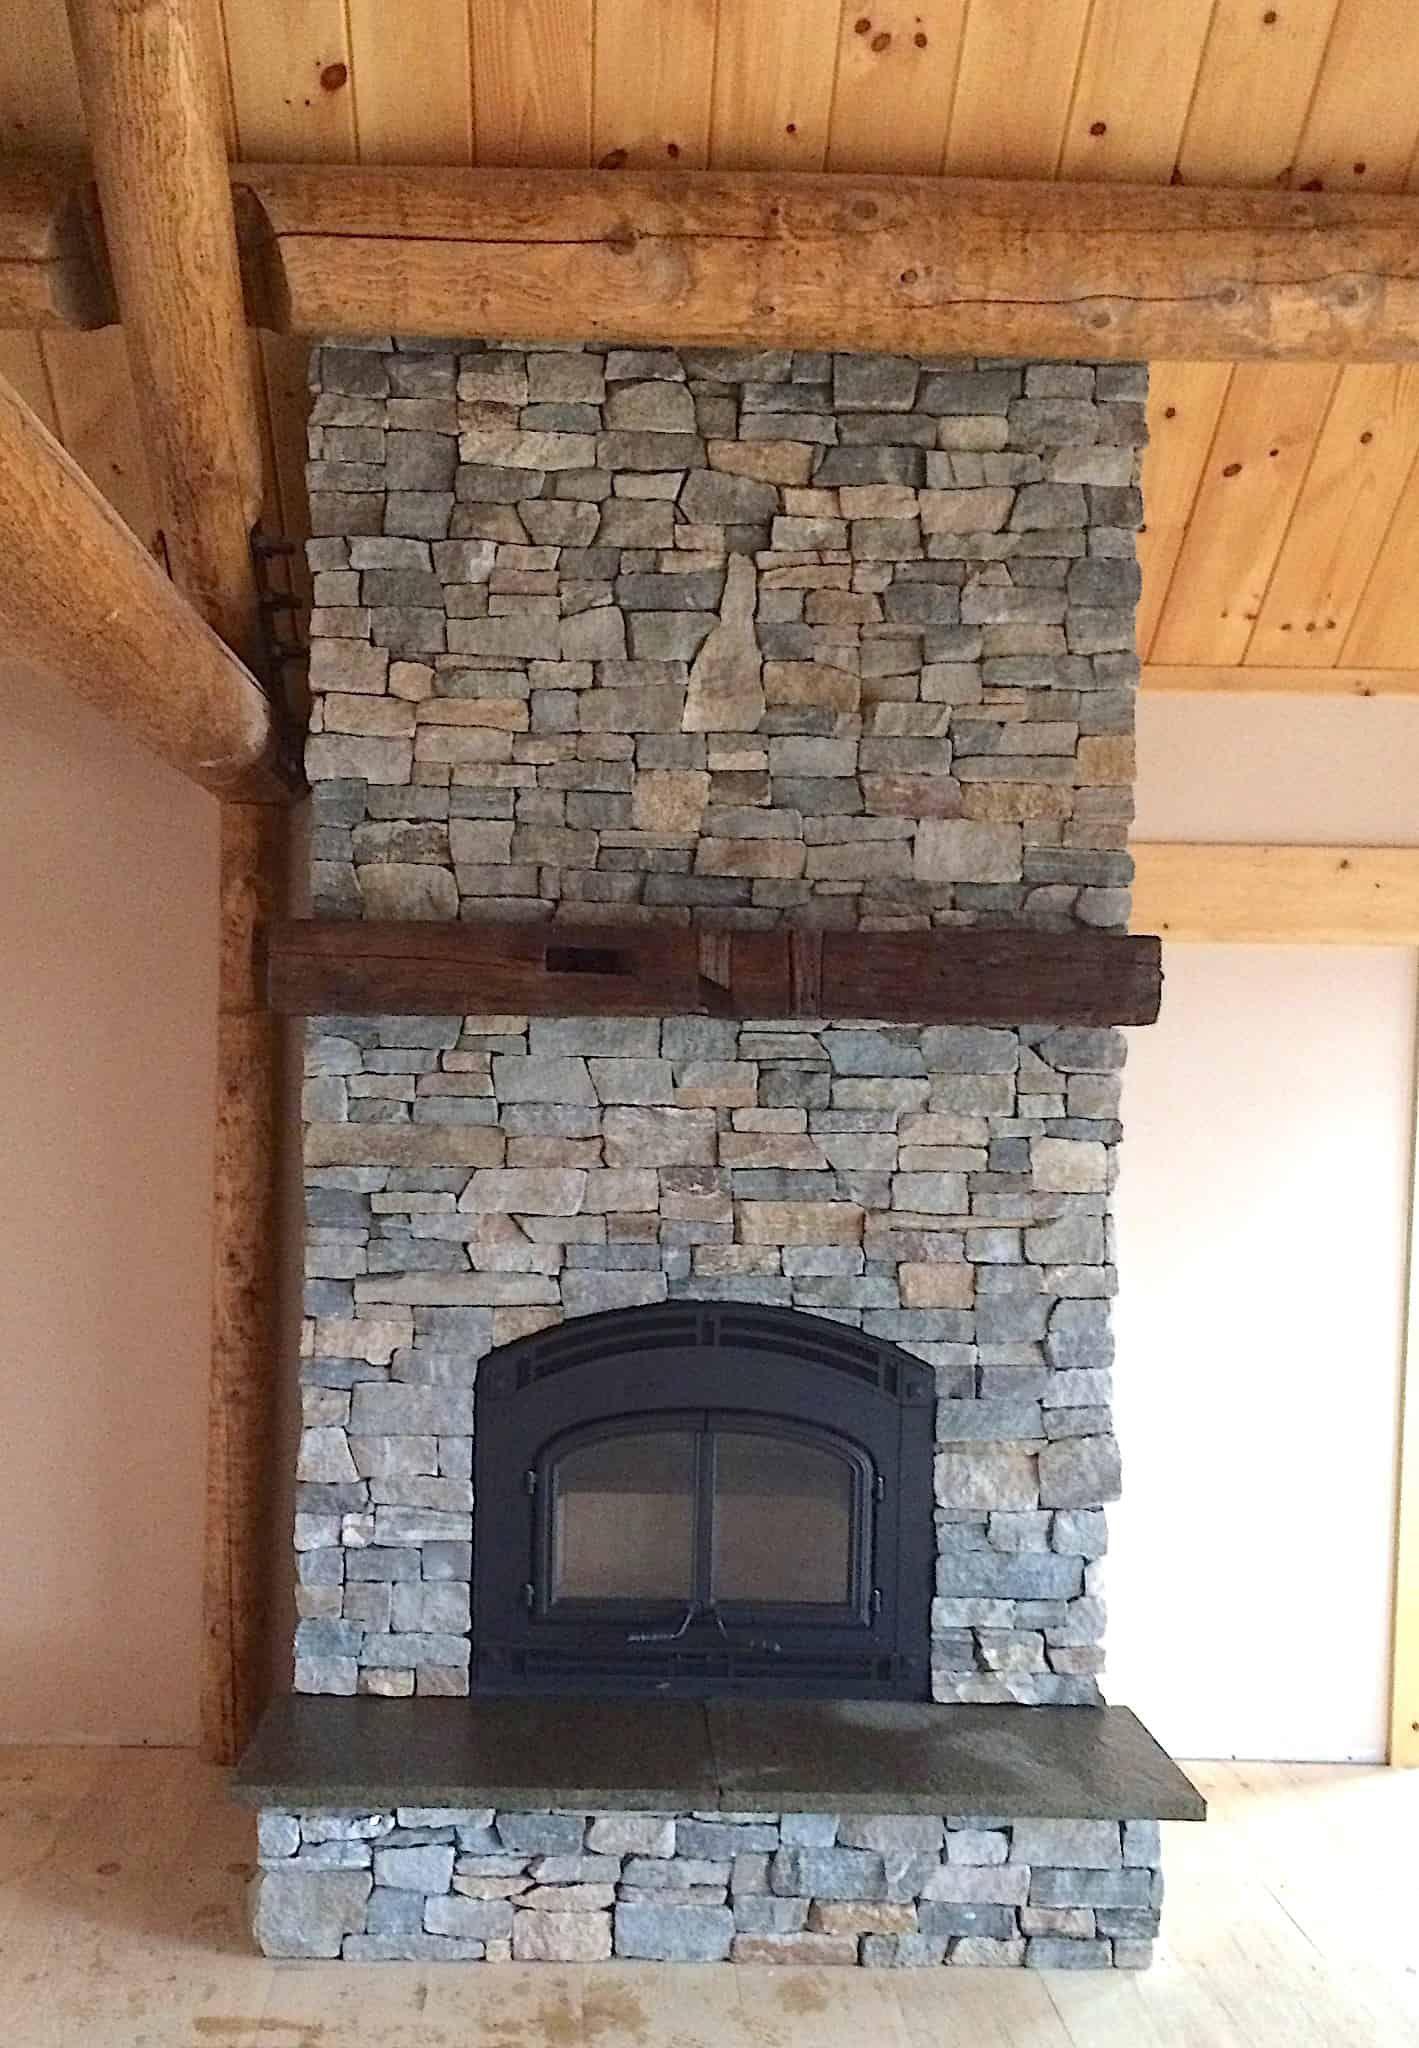 Around Here We Celebrate Fireplace Friday Daily Stoneyard Stone Veneer Fireplace Natural Stone Fireplaces Fireplace